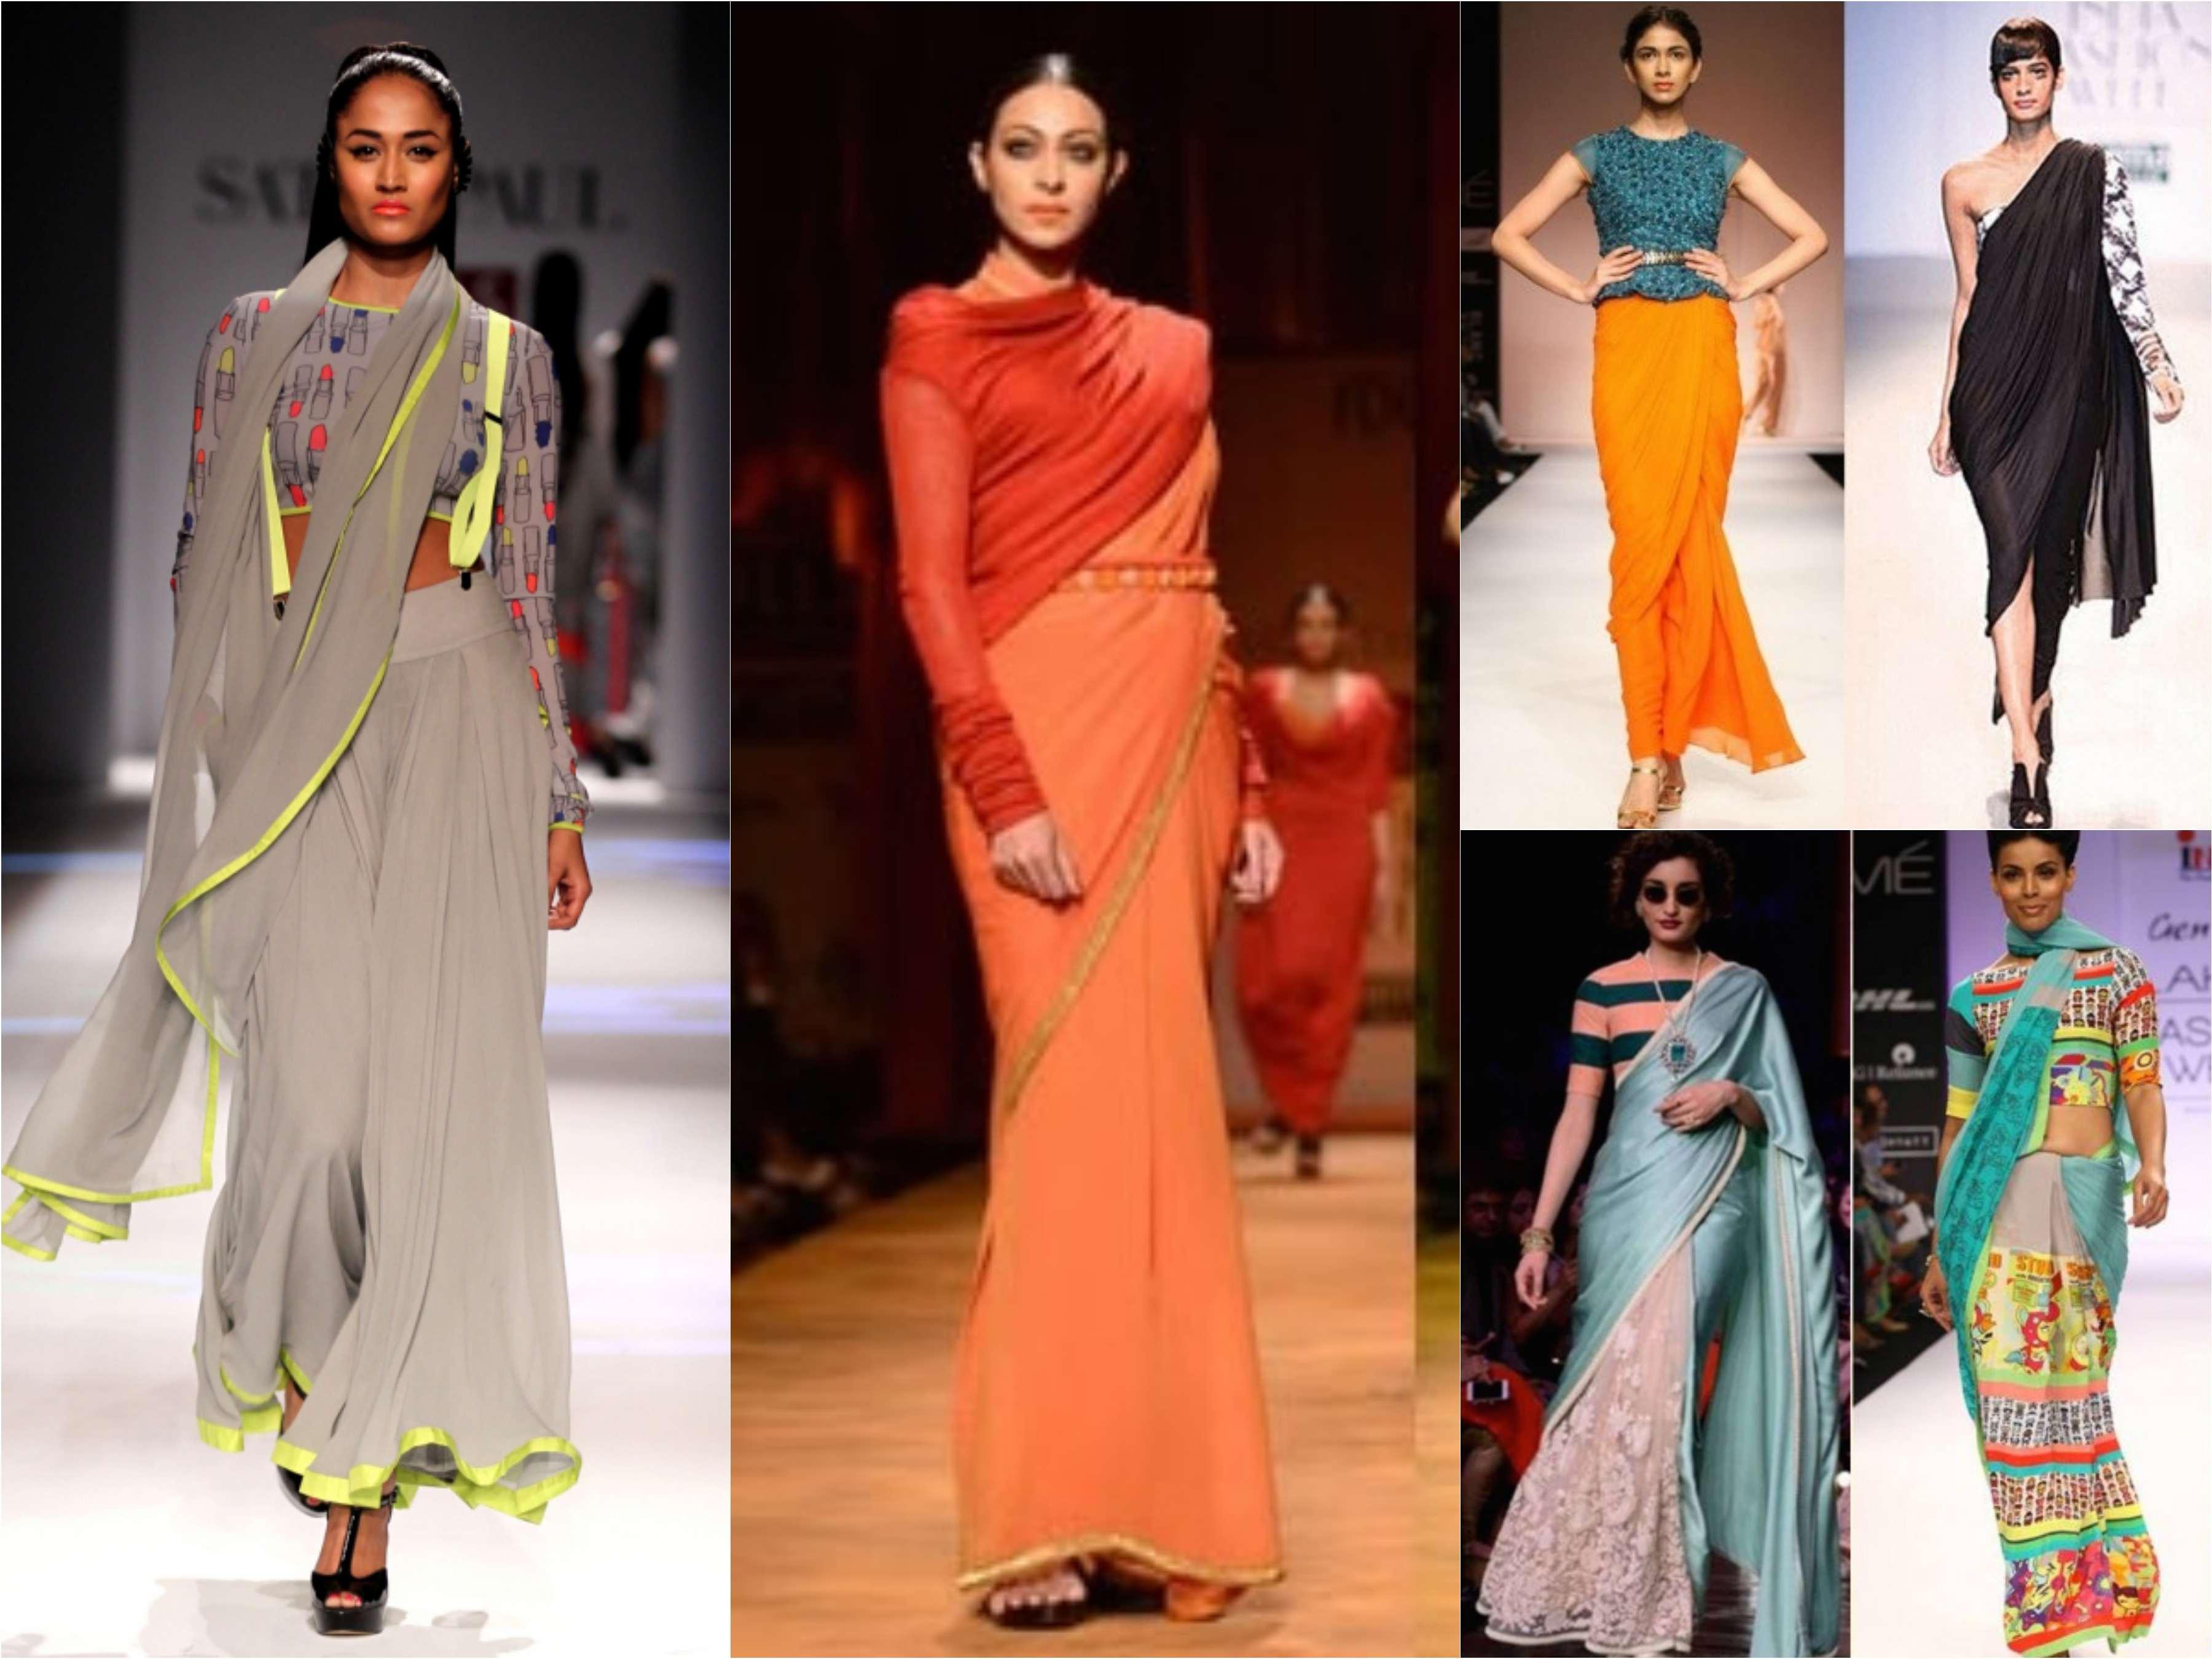 f59c603364de59 Saree- Interesting latest trends to wear a Saree   Reinvent your ...